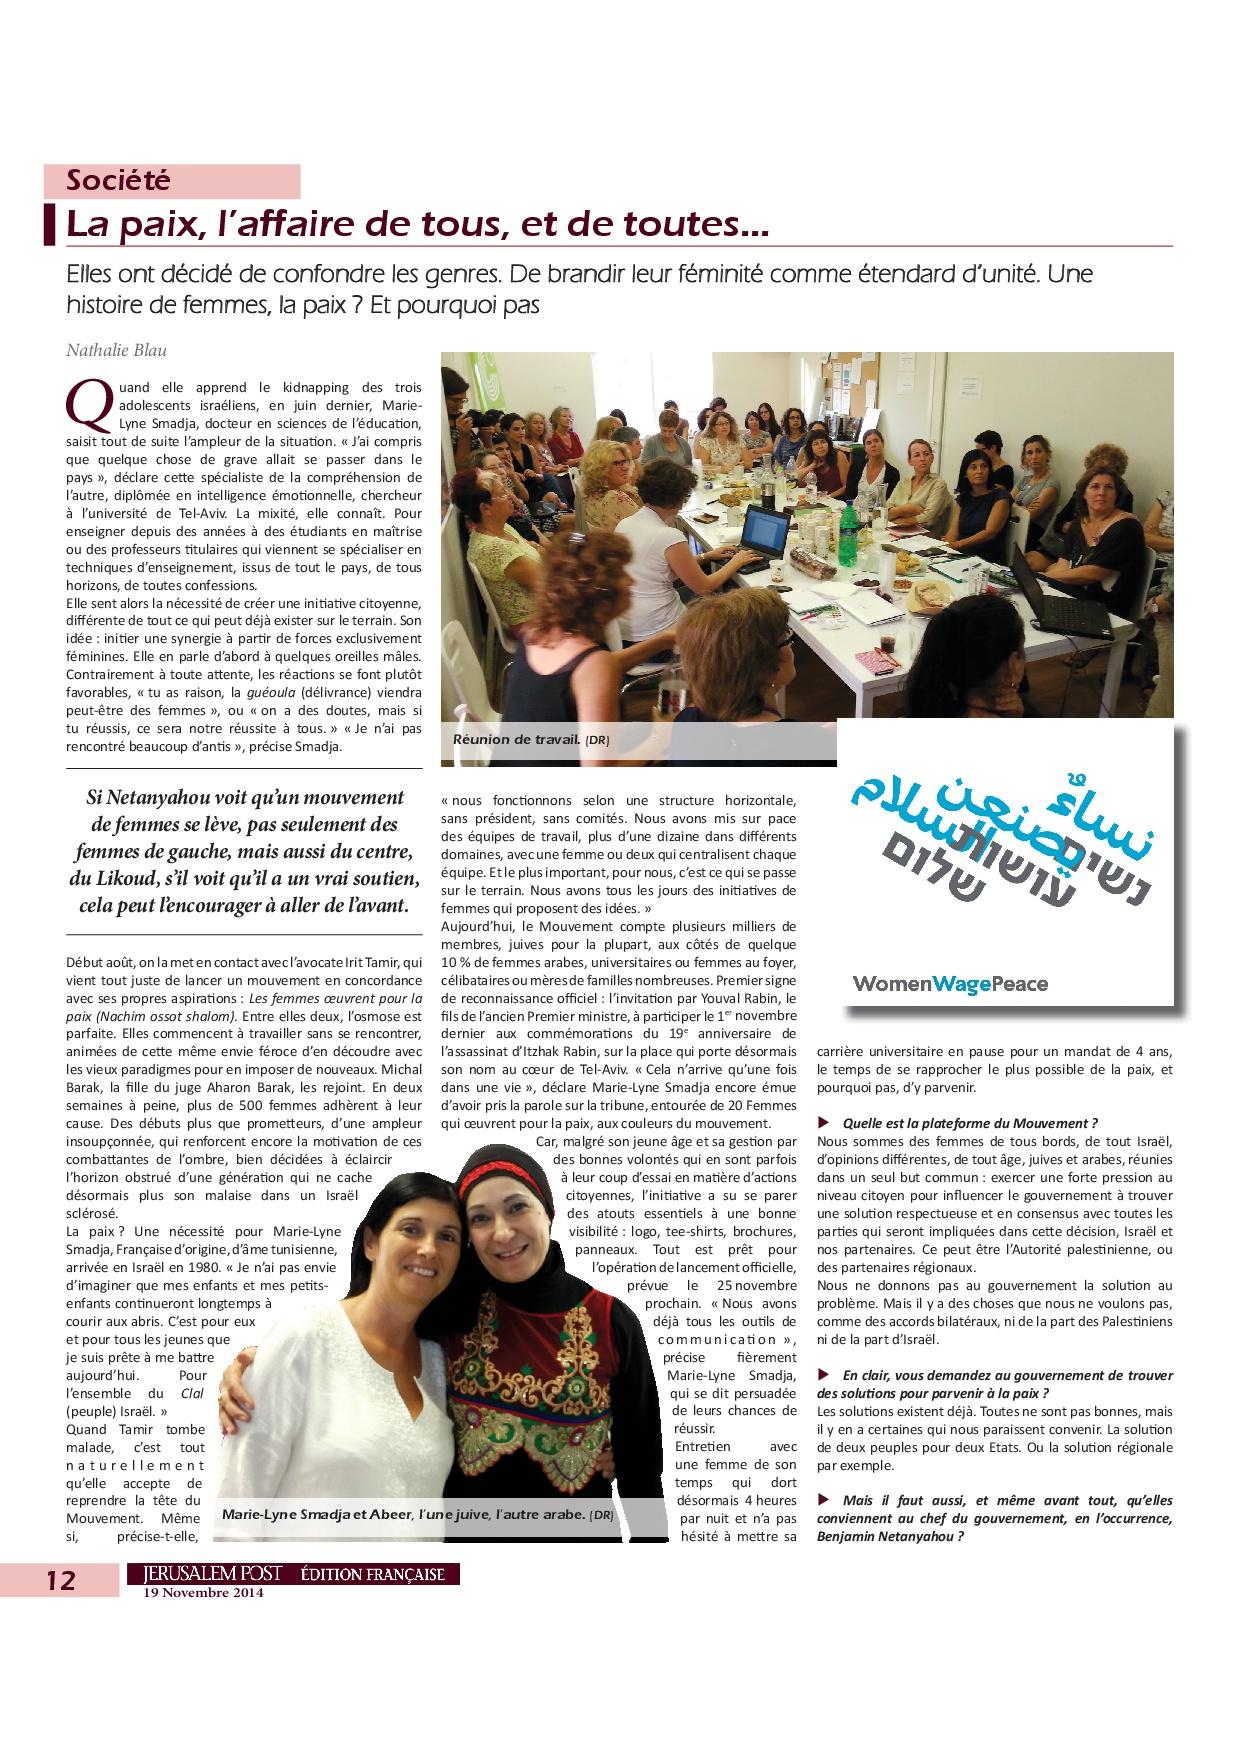 JP Fr Marie-Lyne Nathalie Blau 19 11 141